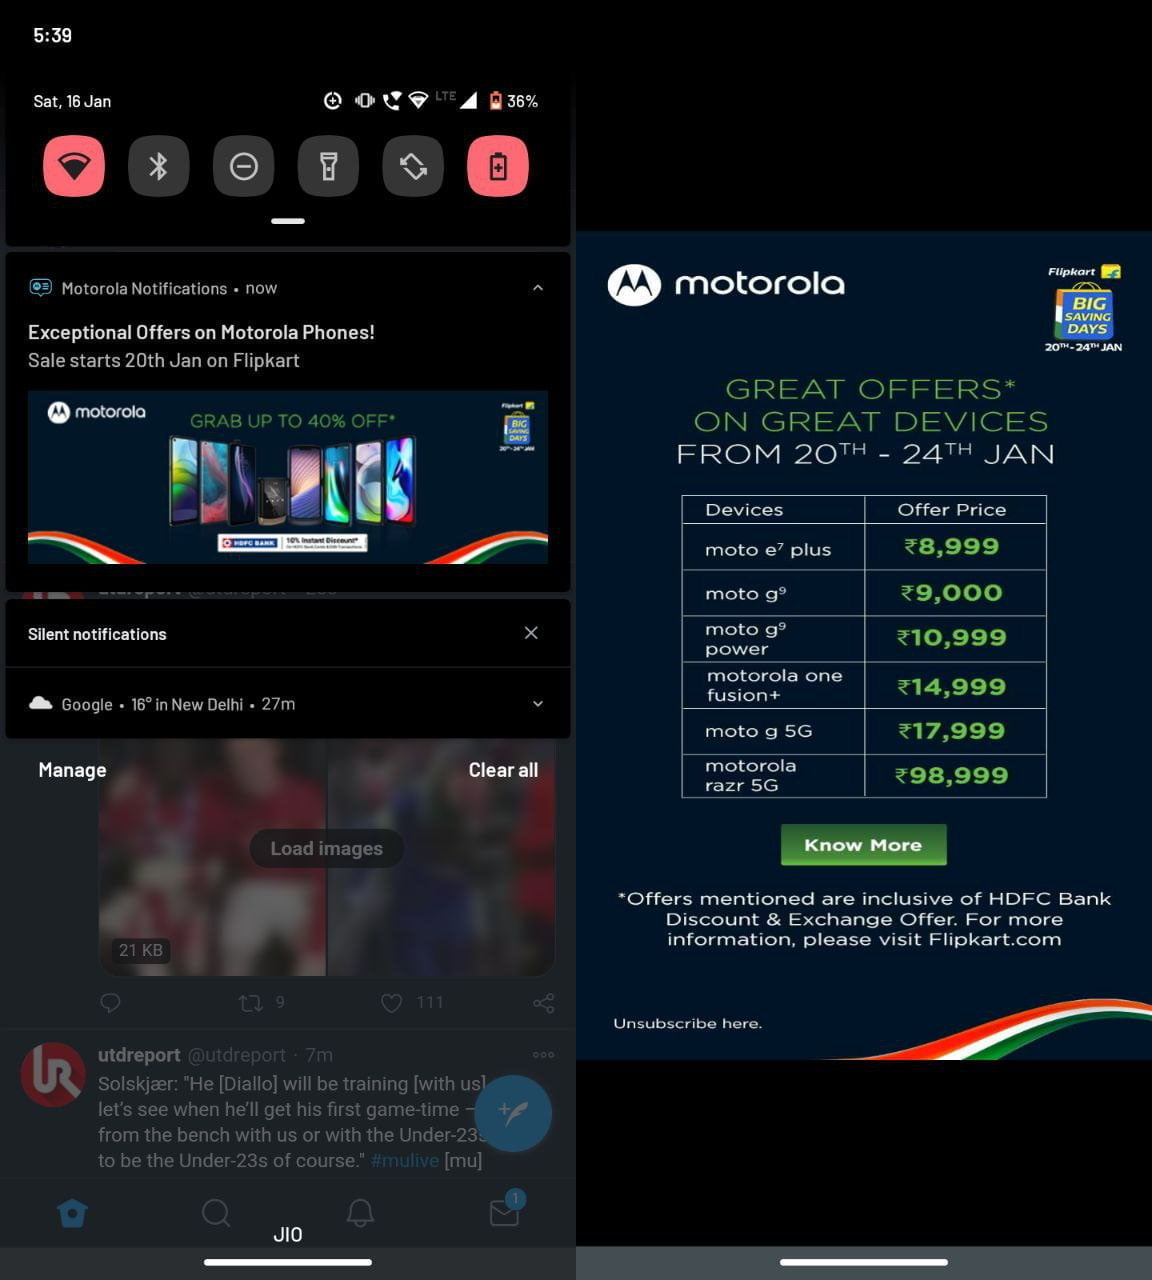 Flipkart Big Savings Day to offer up to 40% off on Motorola Phones